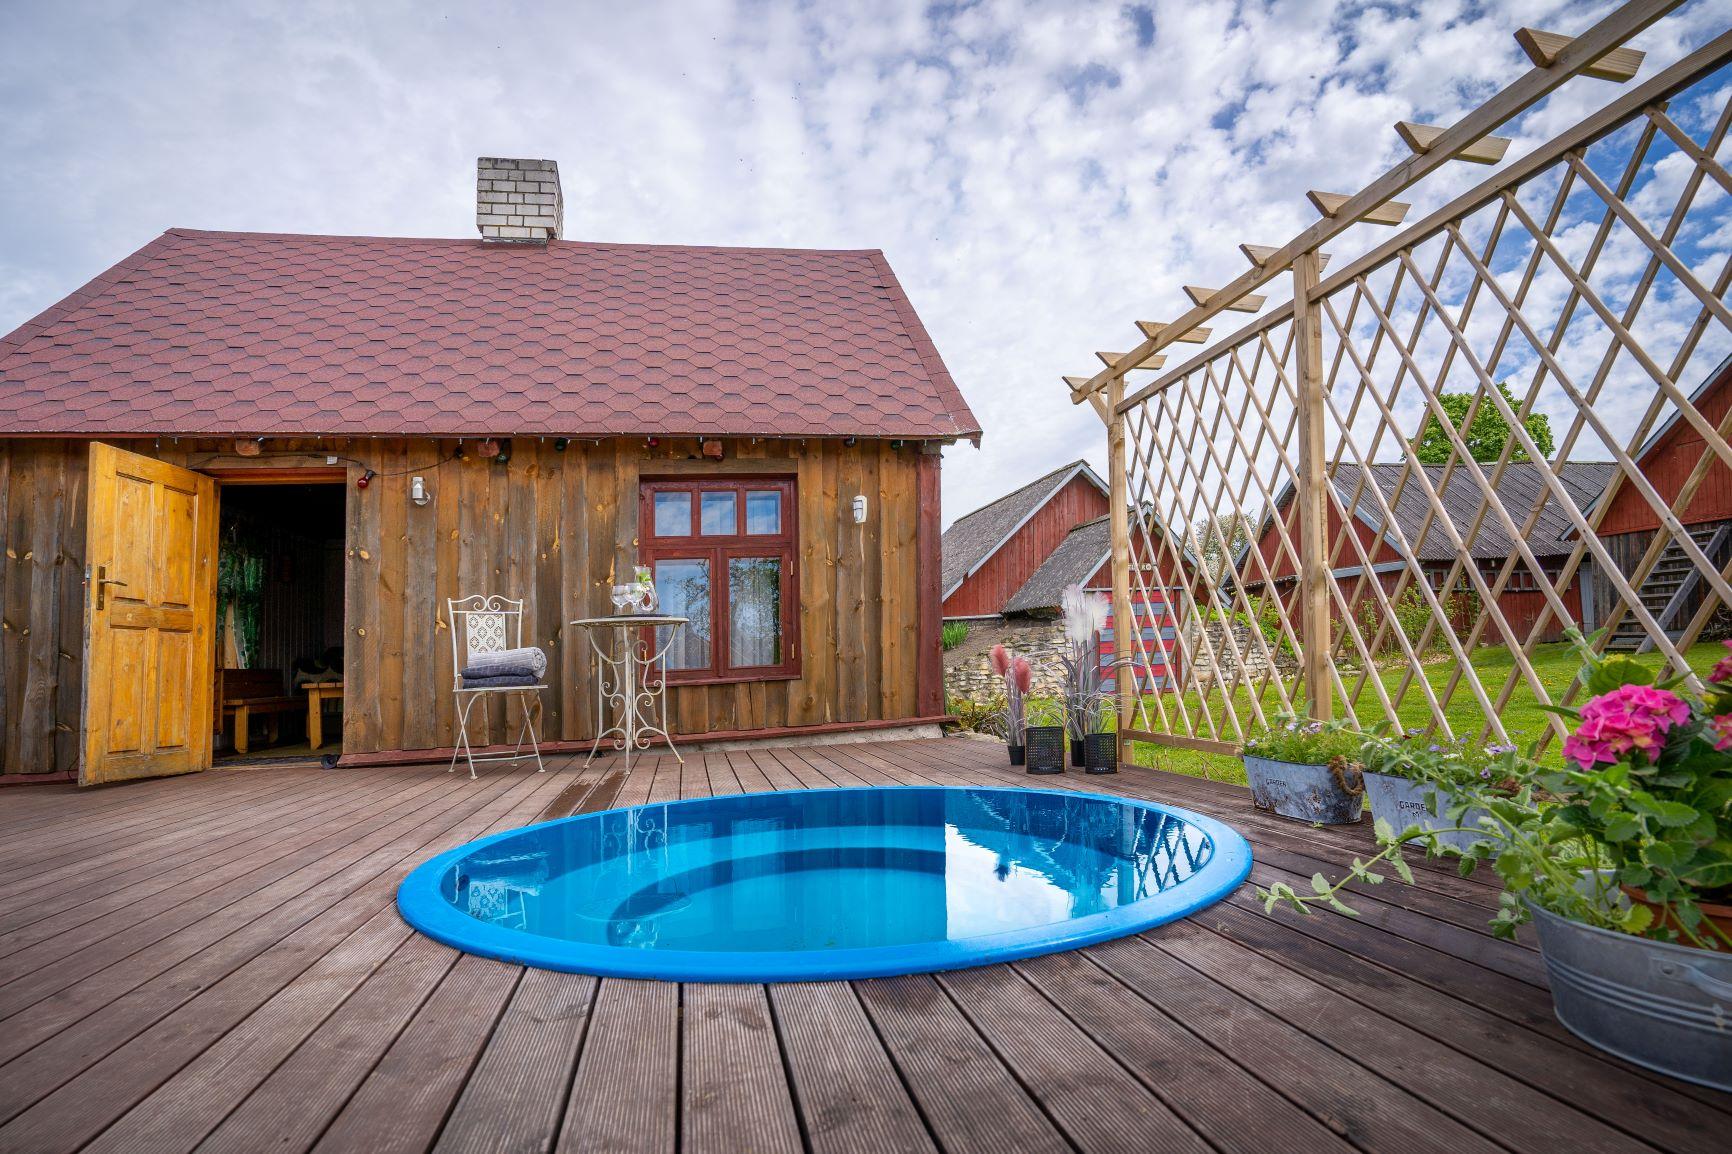 Hindreku saun